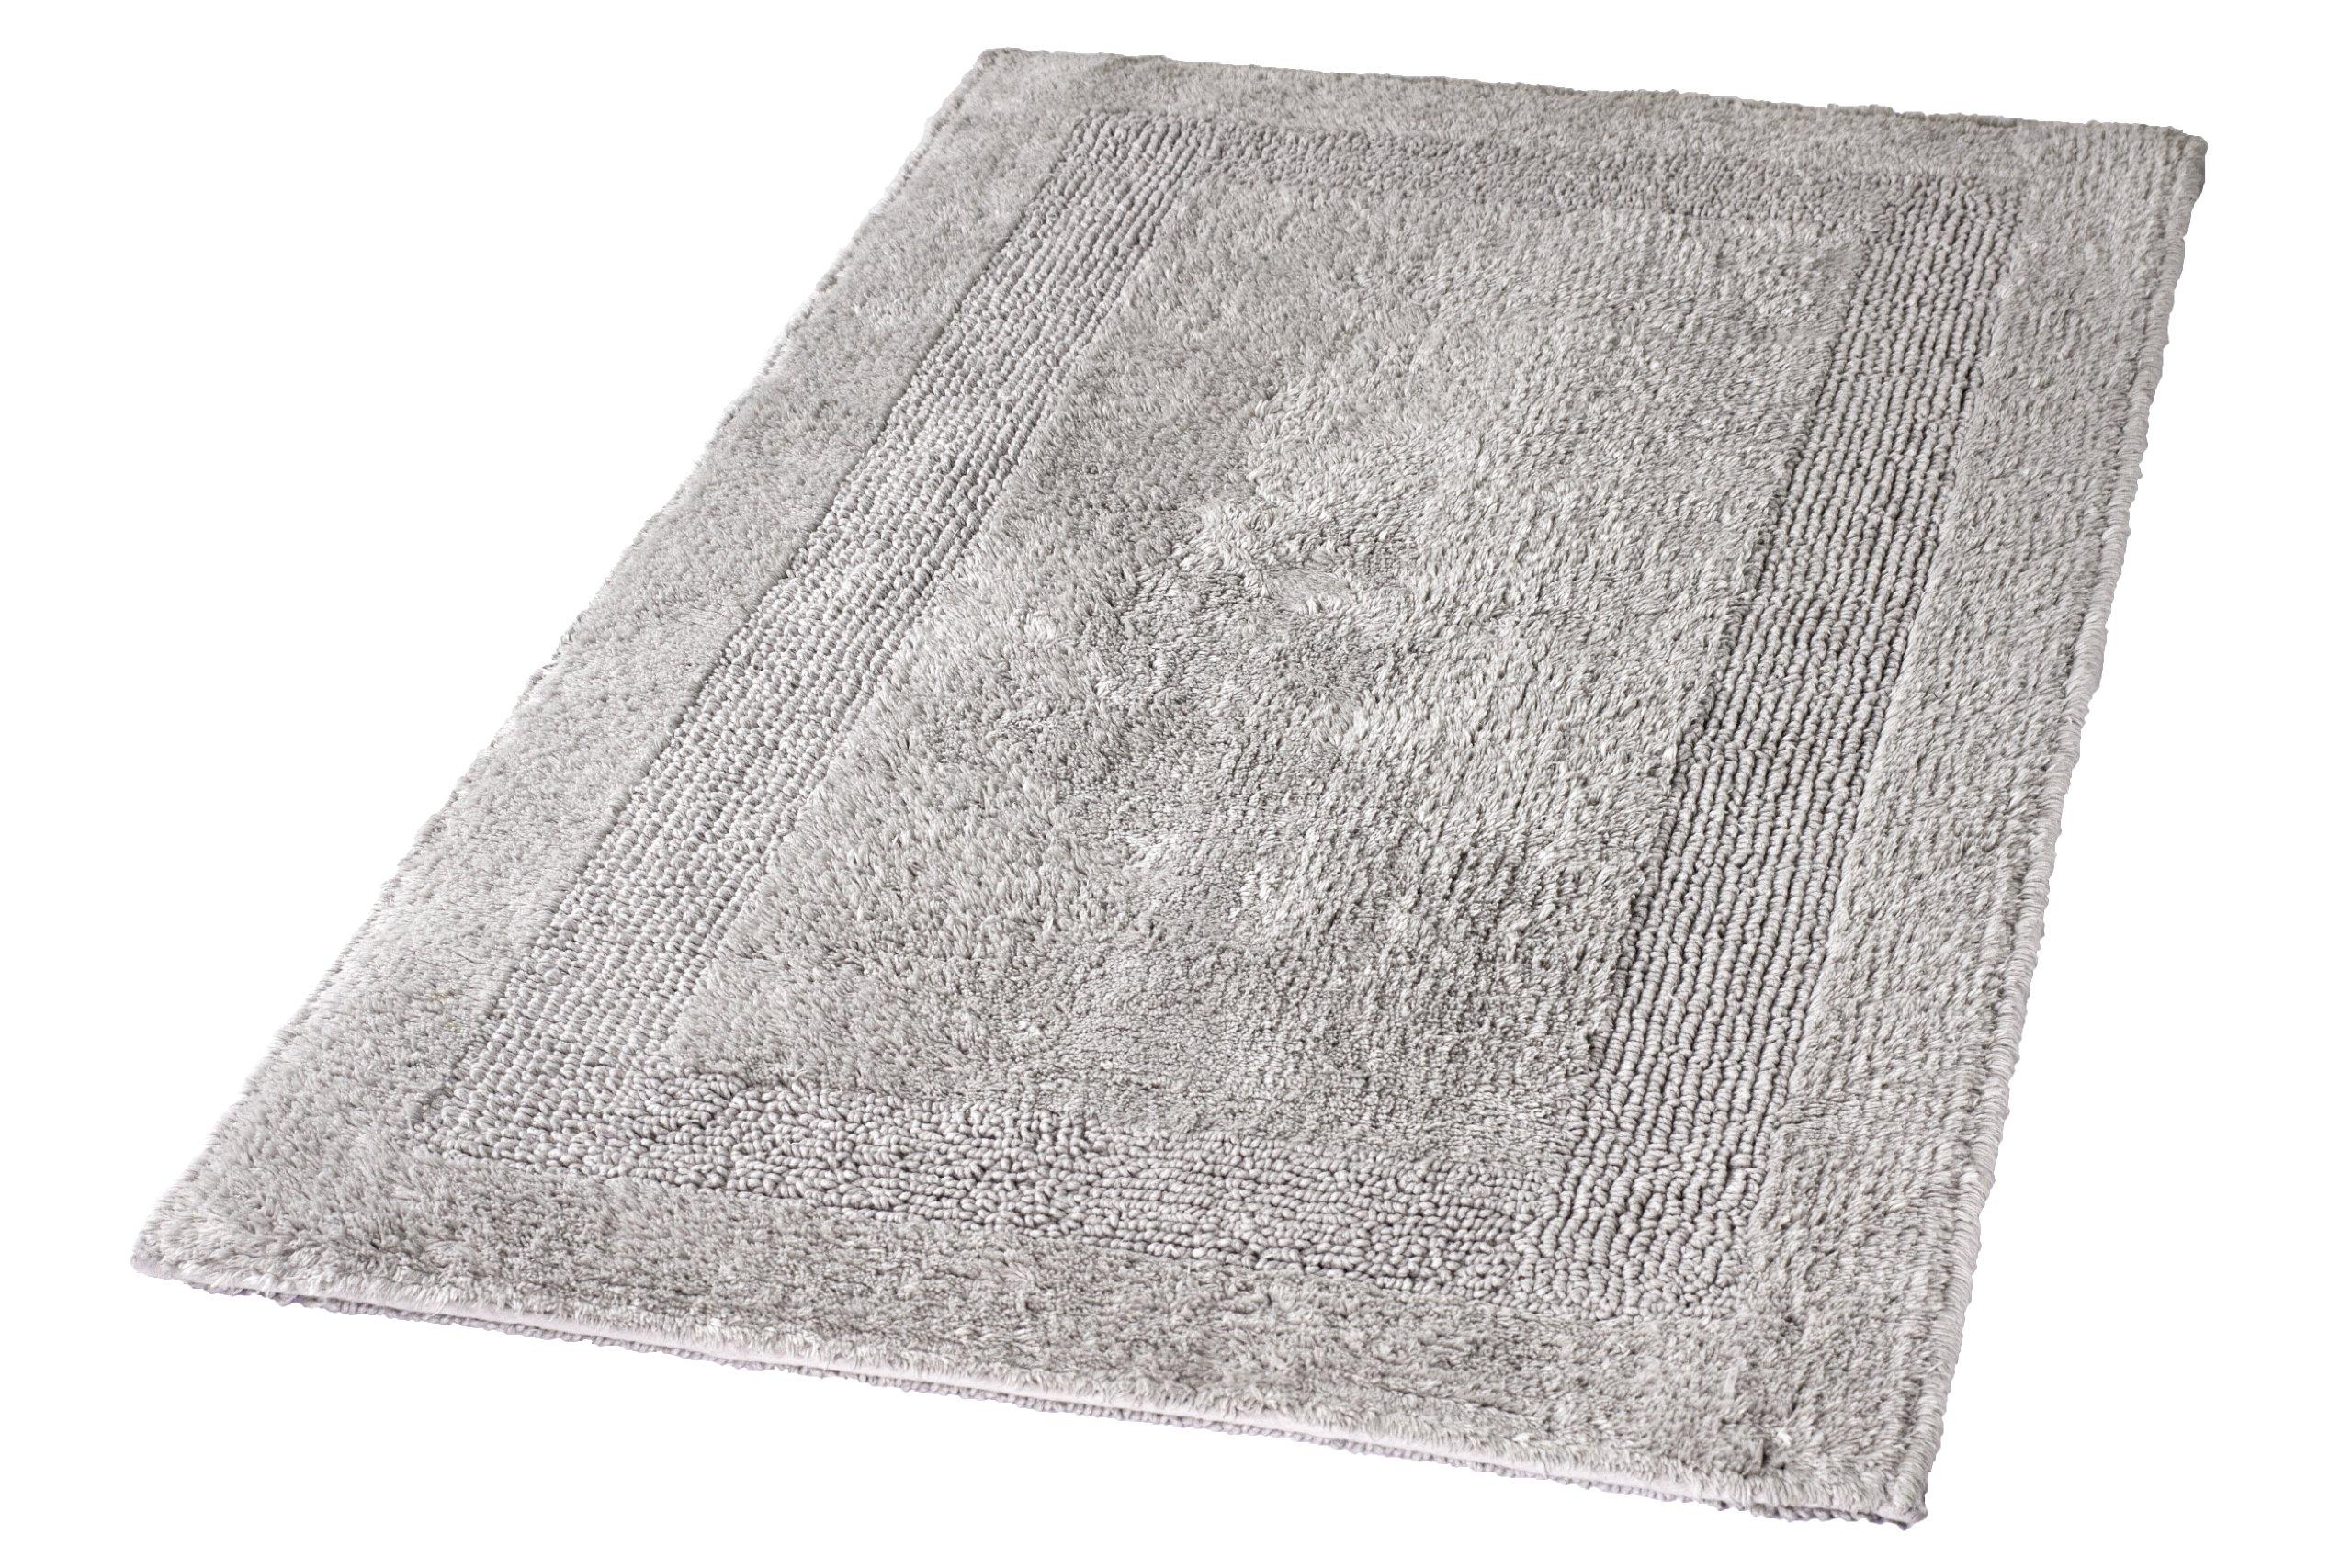 Kleine Wolke Eco Living Arizona Reversible Cotton Bathroom Rug (31.5 x 55.1in, Silver Grey)